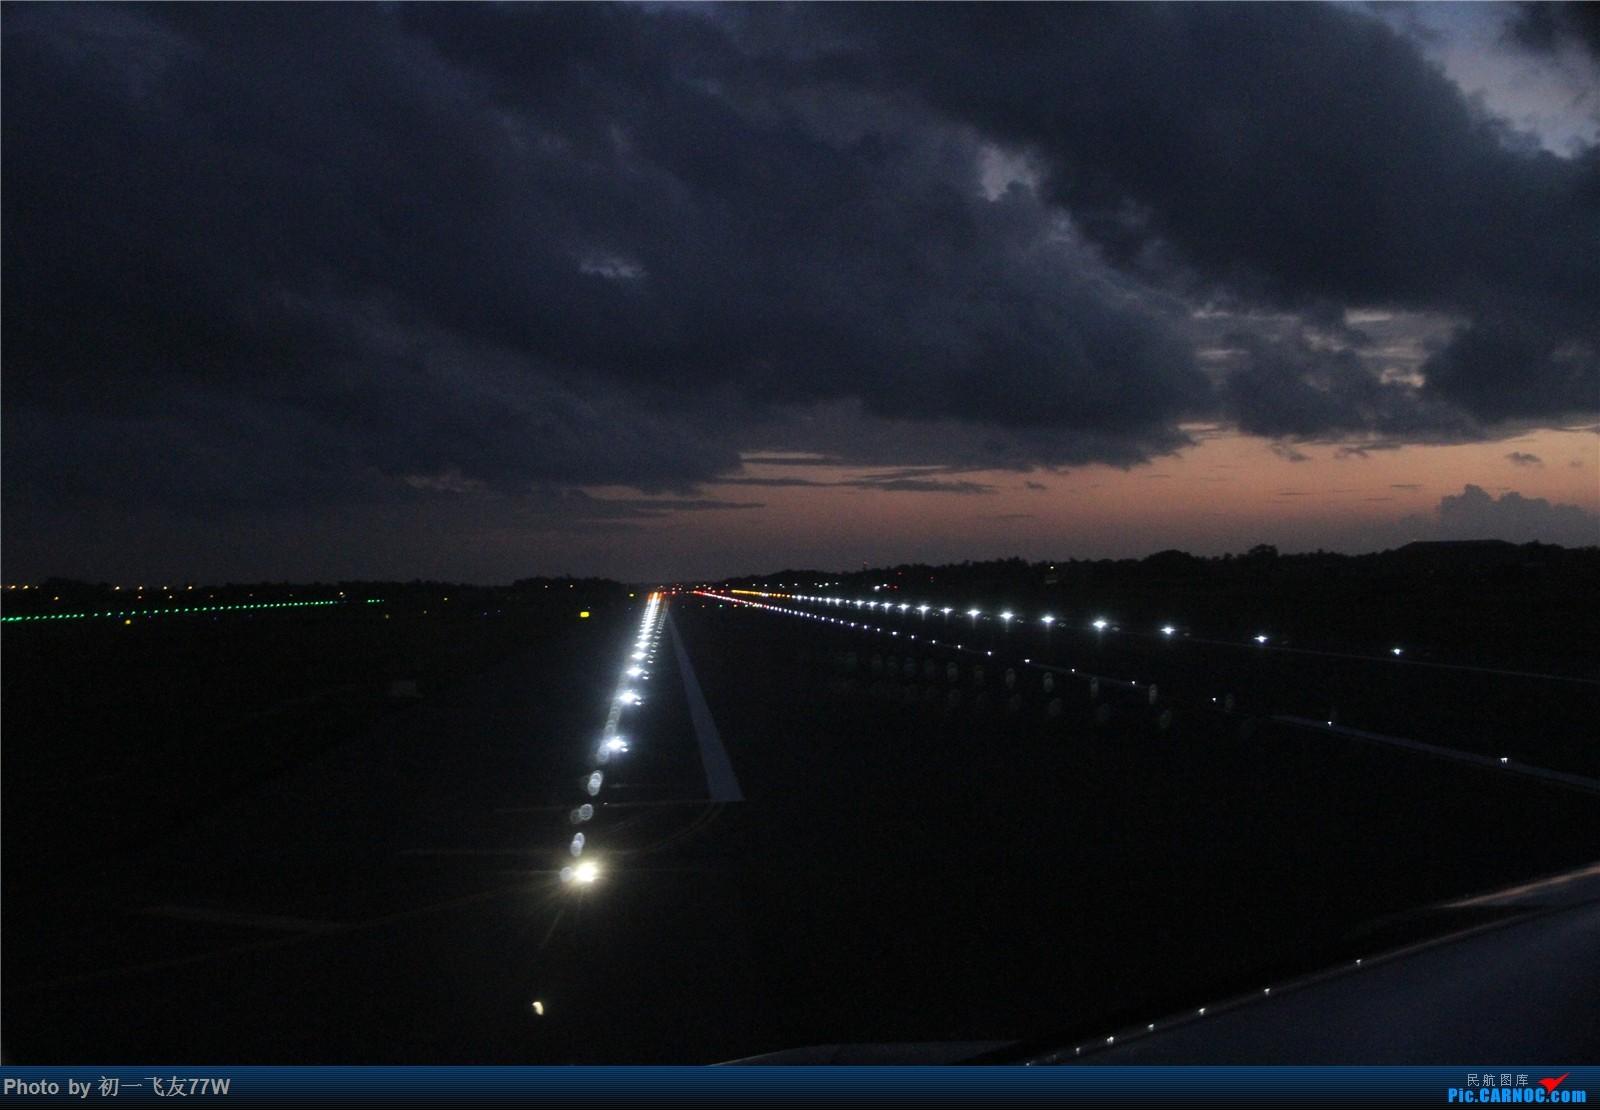 Re:[原创]【小吕游记第二季】马尔代夫往返,DHC-6水上飞机体验 AIRBUS A330-300 B-5966